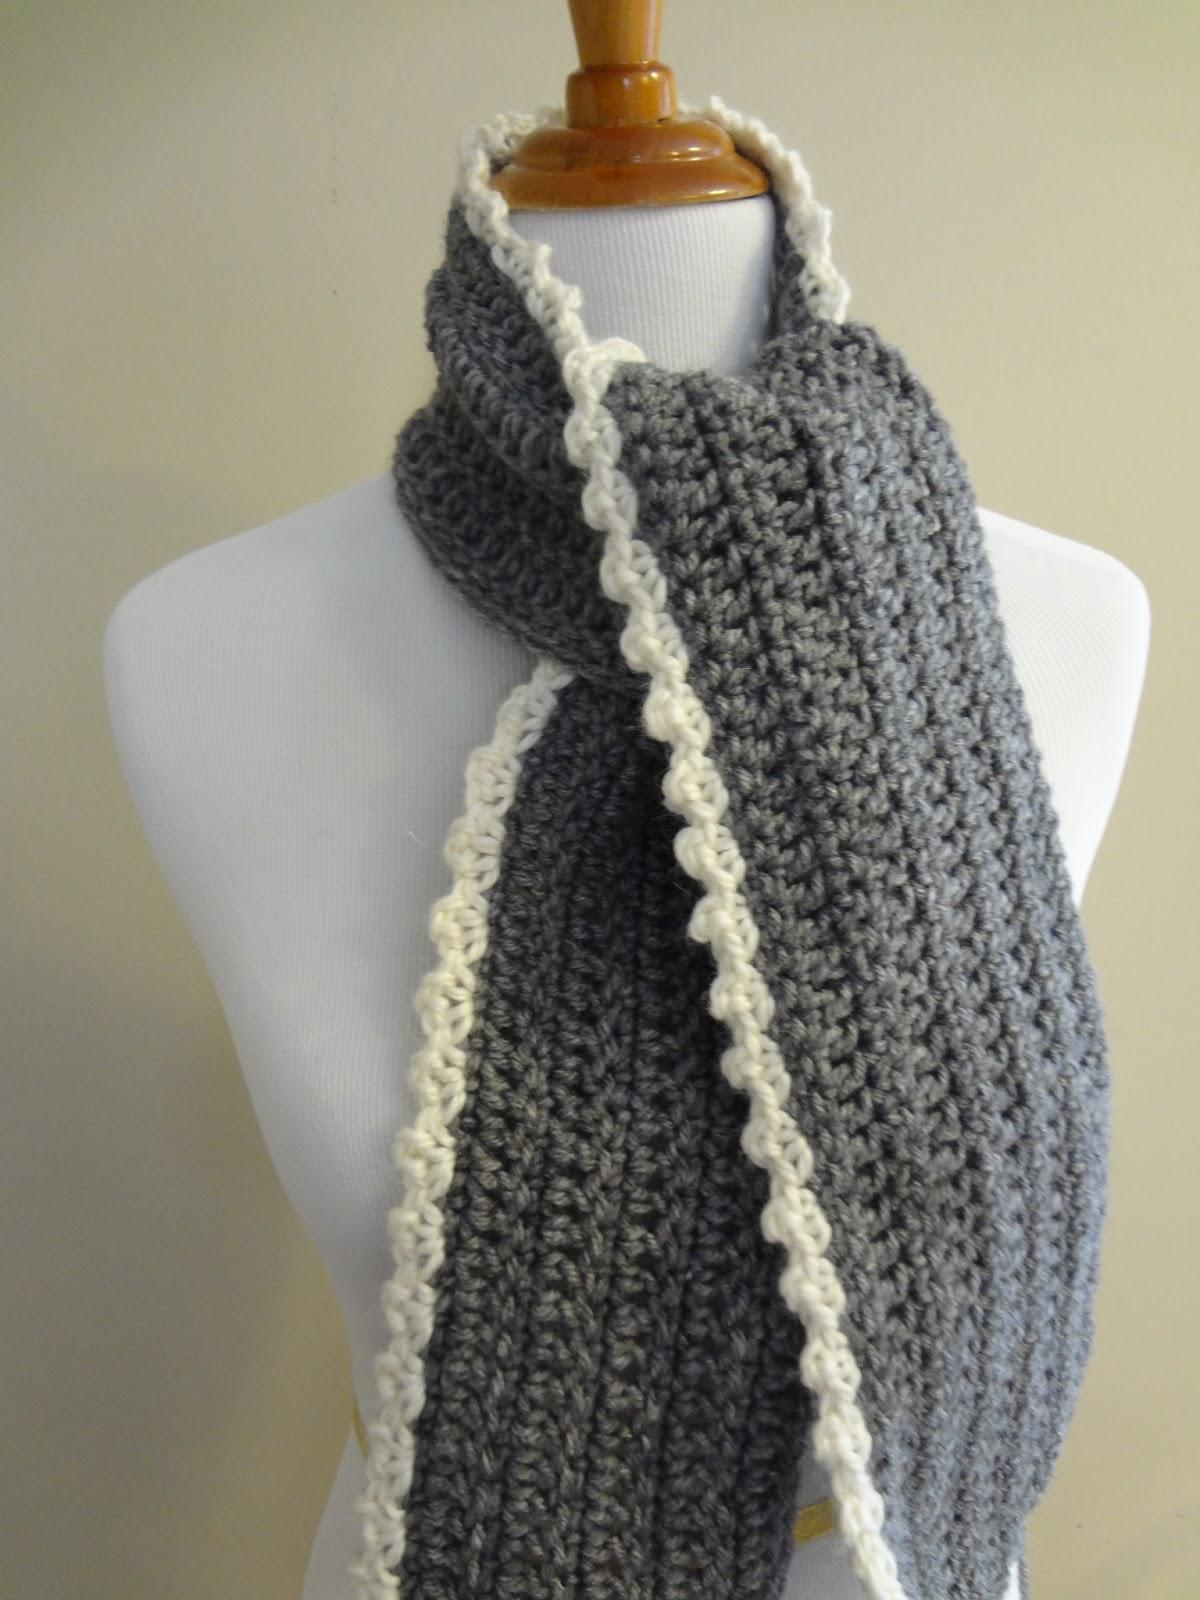 Scarf Crochet Pattern Free to Upgrade Your Winter Style Fiber Flux Free Crochet Patterningrid Scarf